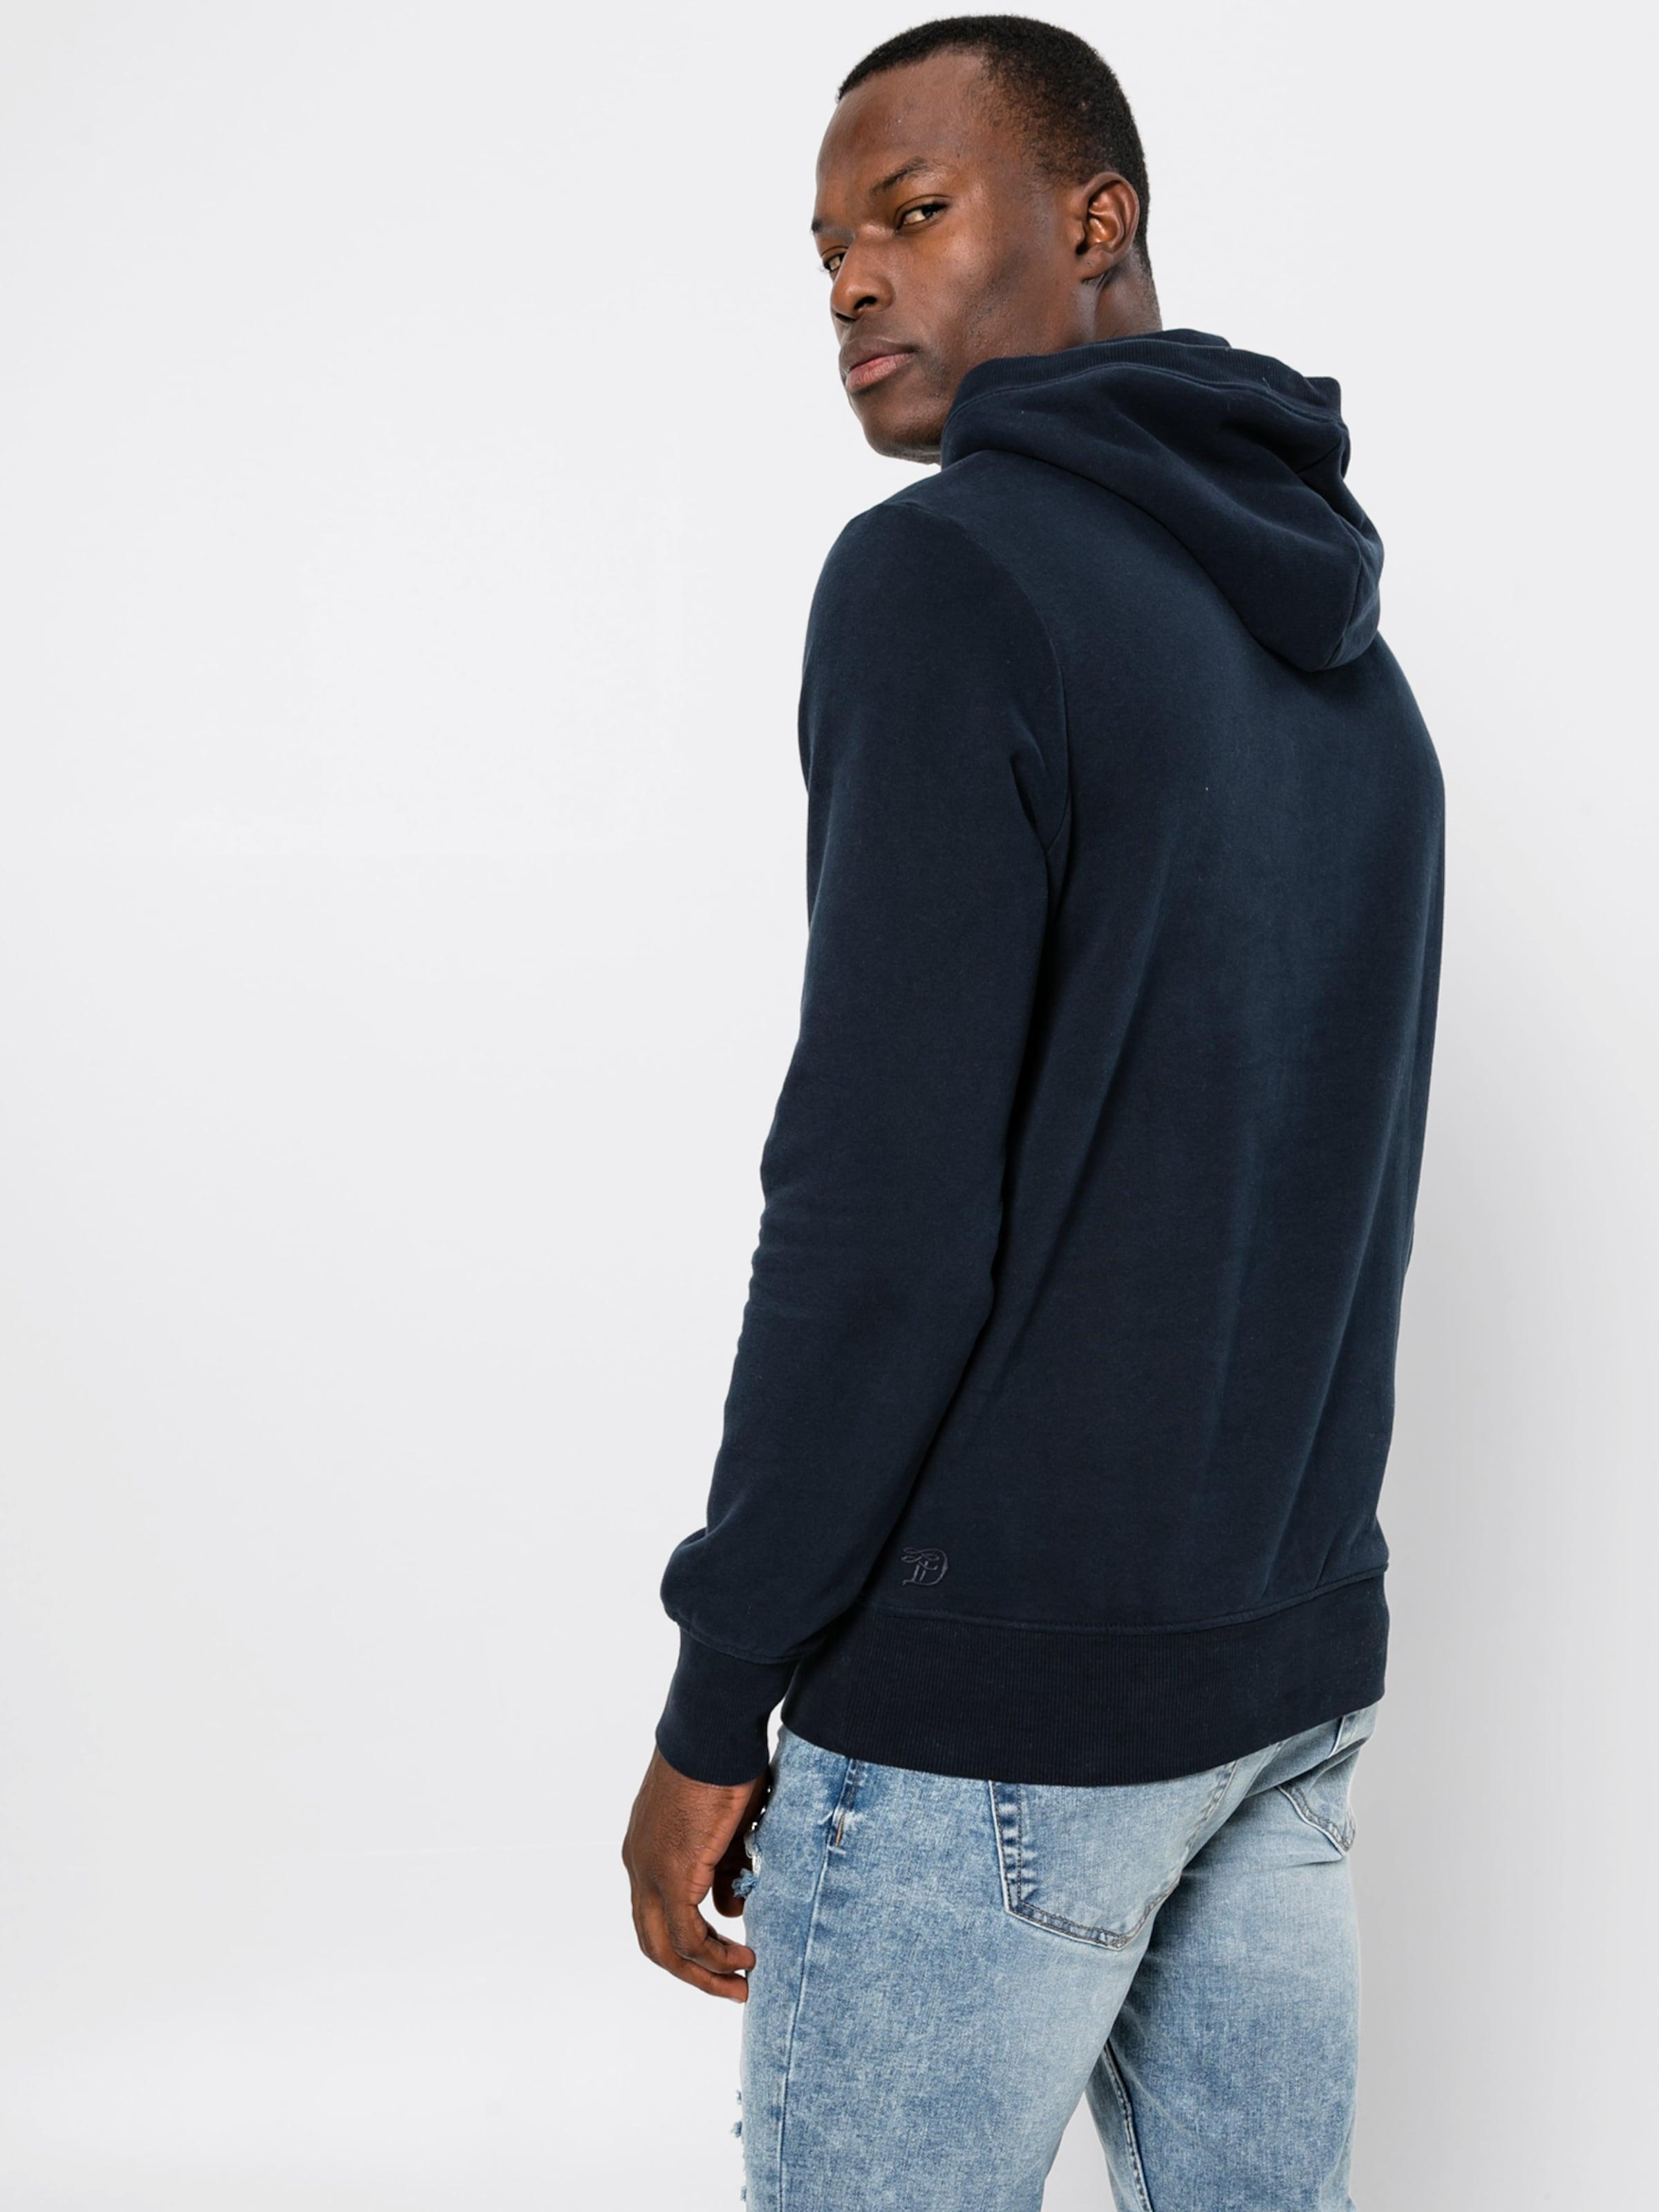 Tom Vert Tailor En Sweat Denim shirt FoncéRouge Nyw8mnv0O